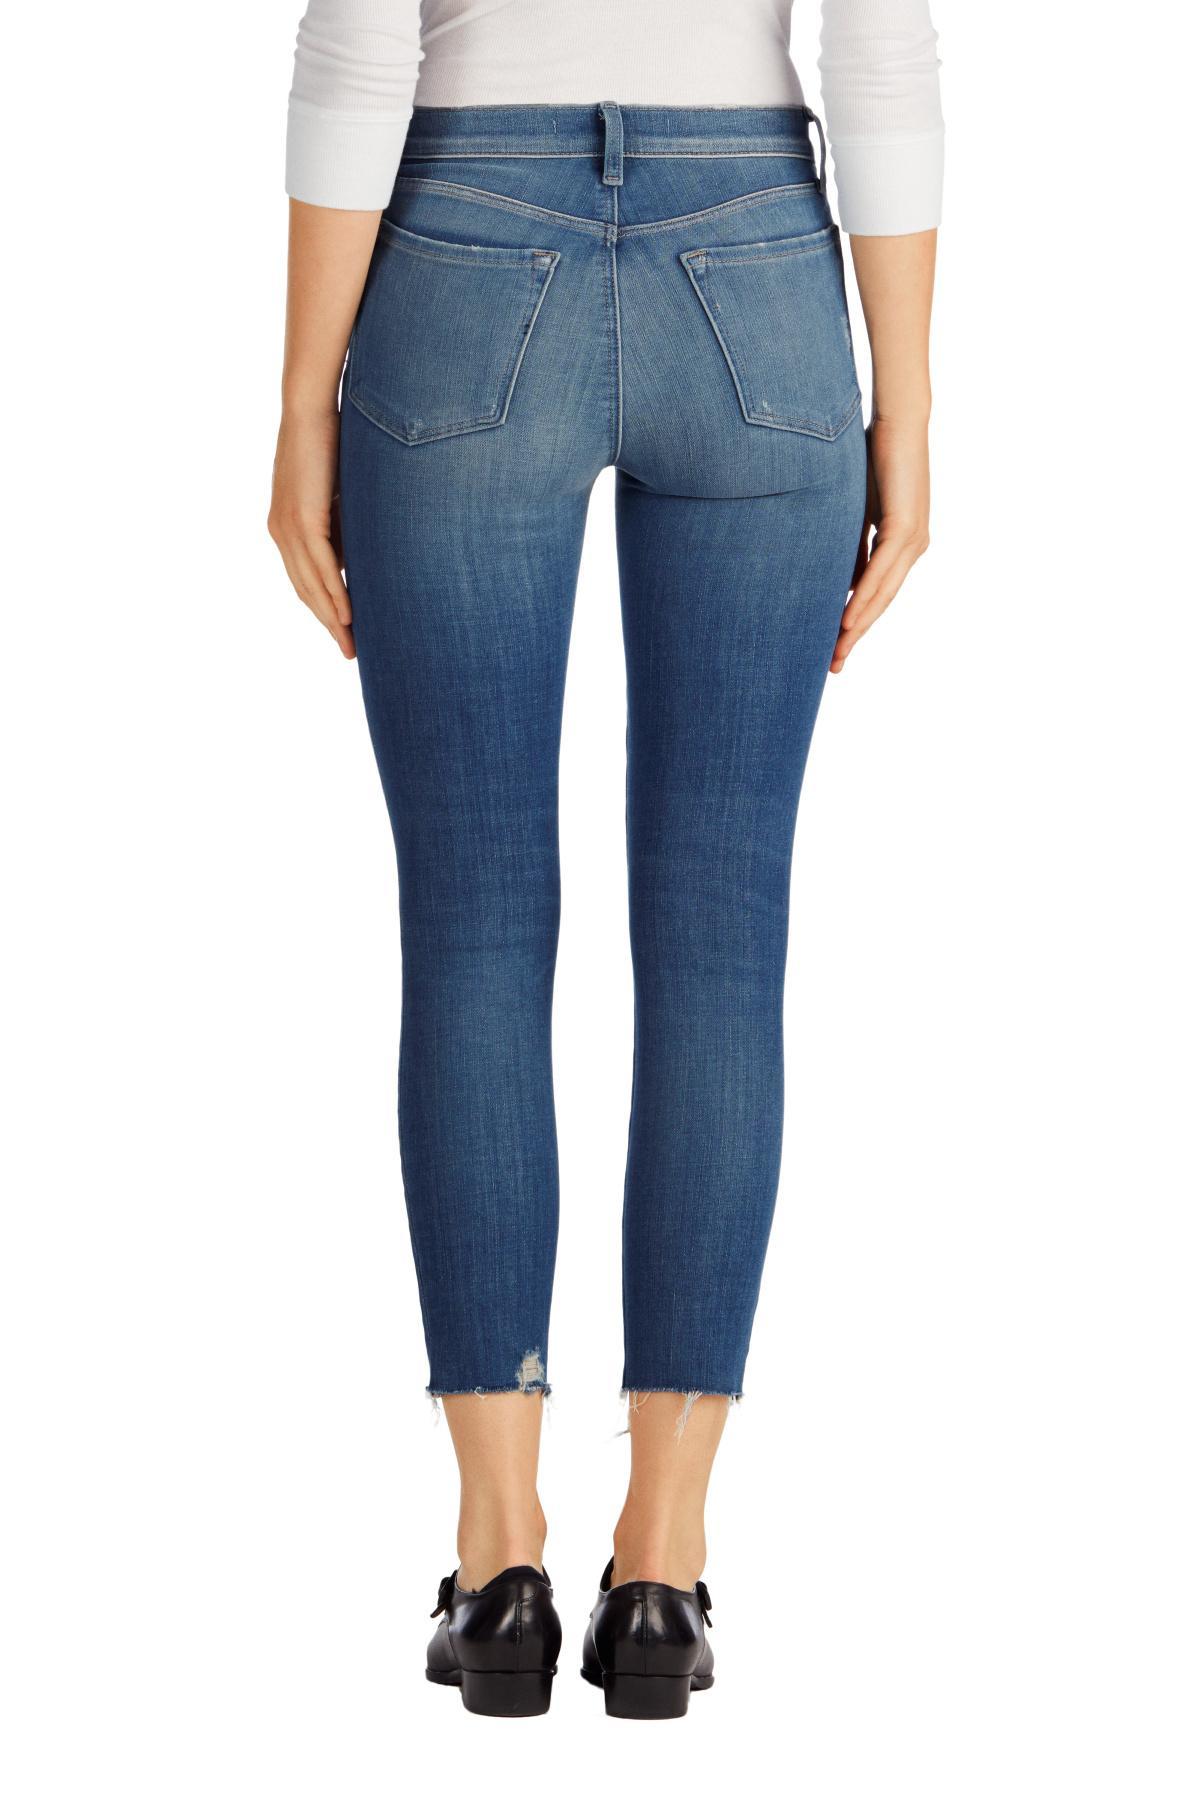 lyst j brand alana high waist crop skinny jeans in blue. Black Bedroom Furniture Sets. Home Design Ideas